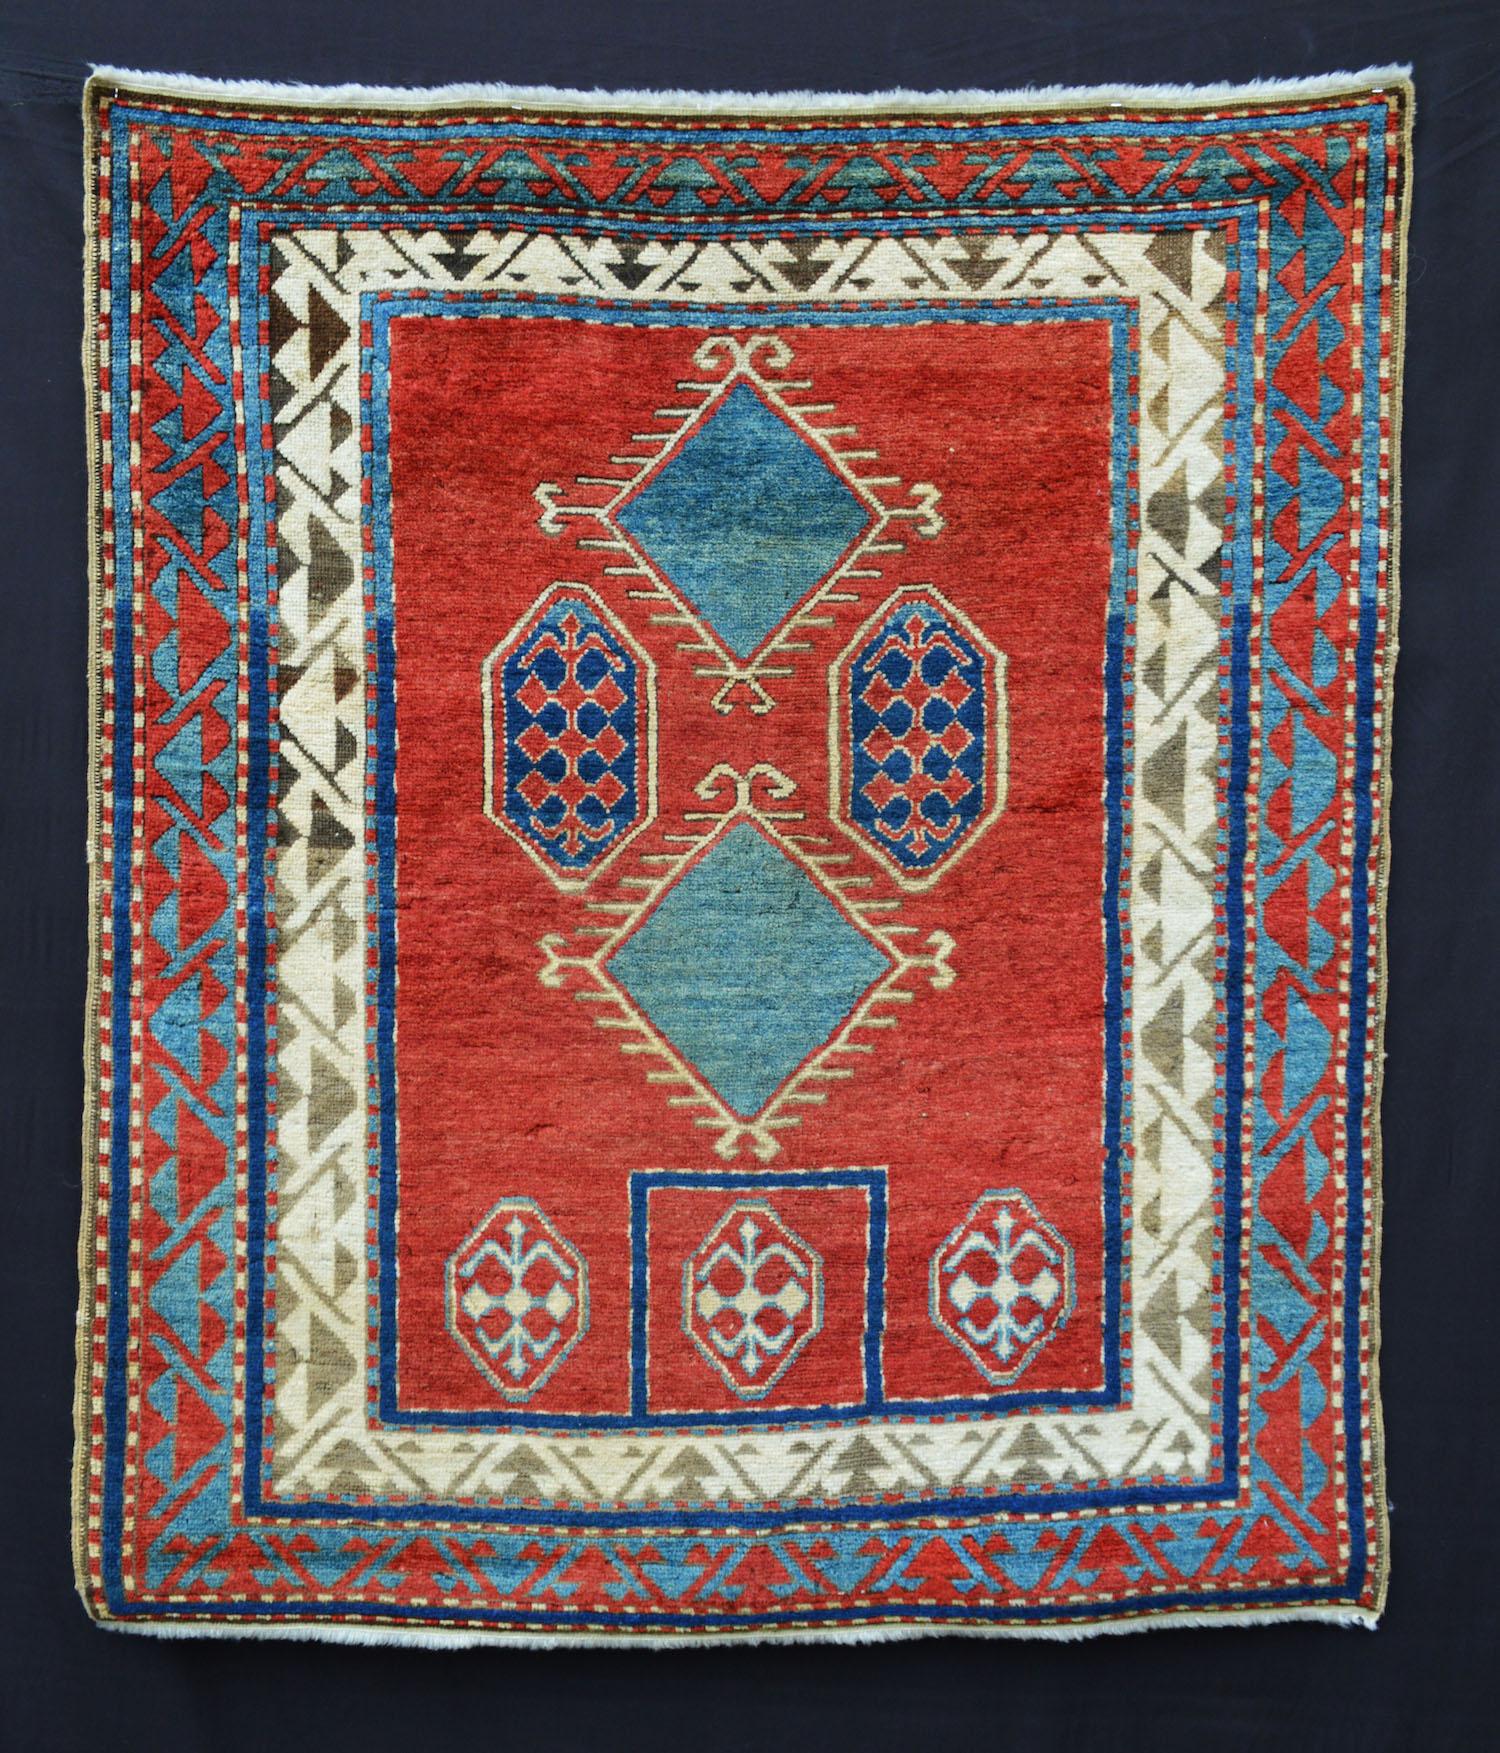 Qashqa'i Tribes